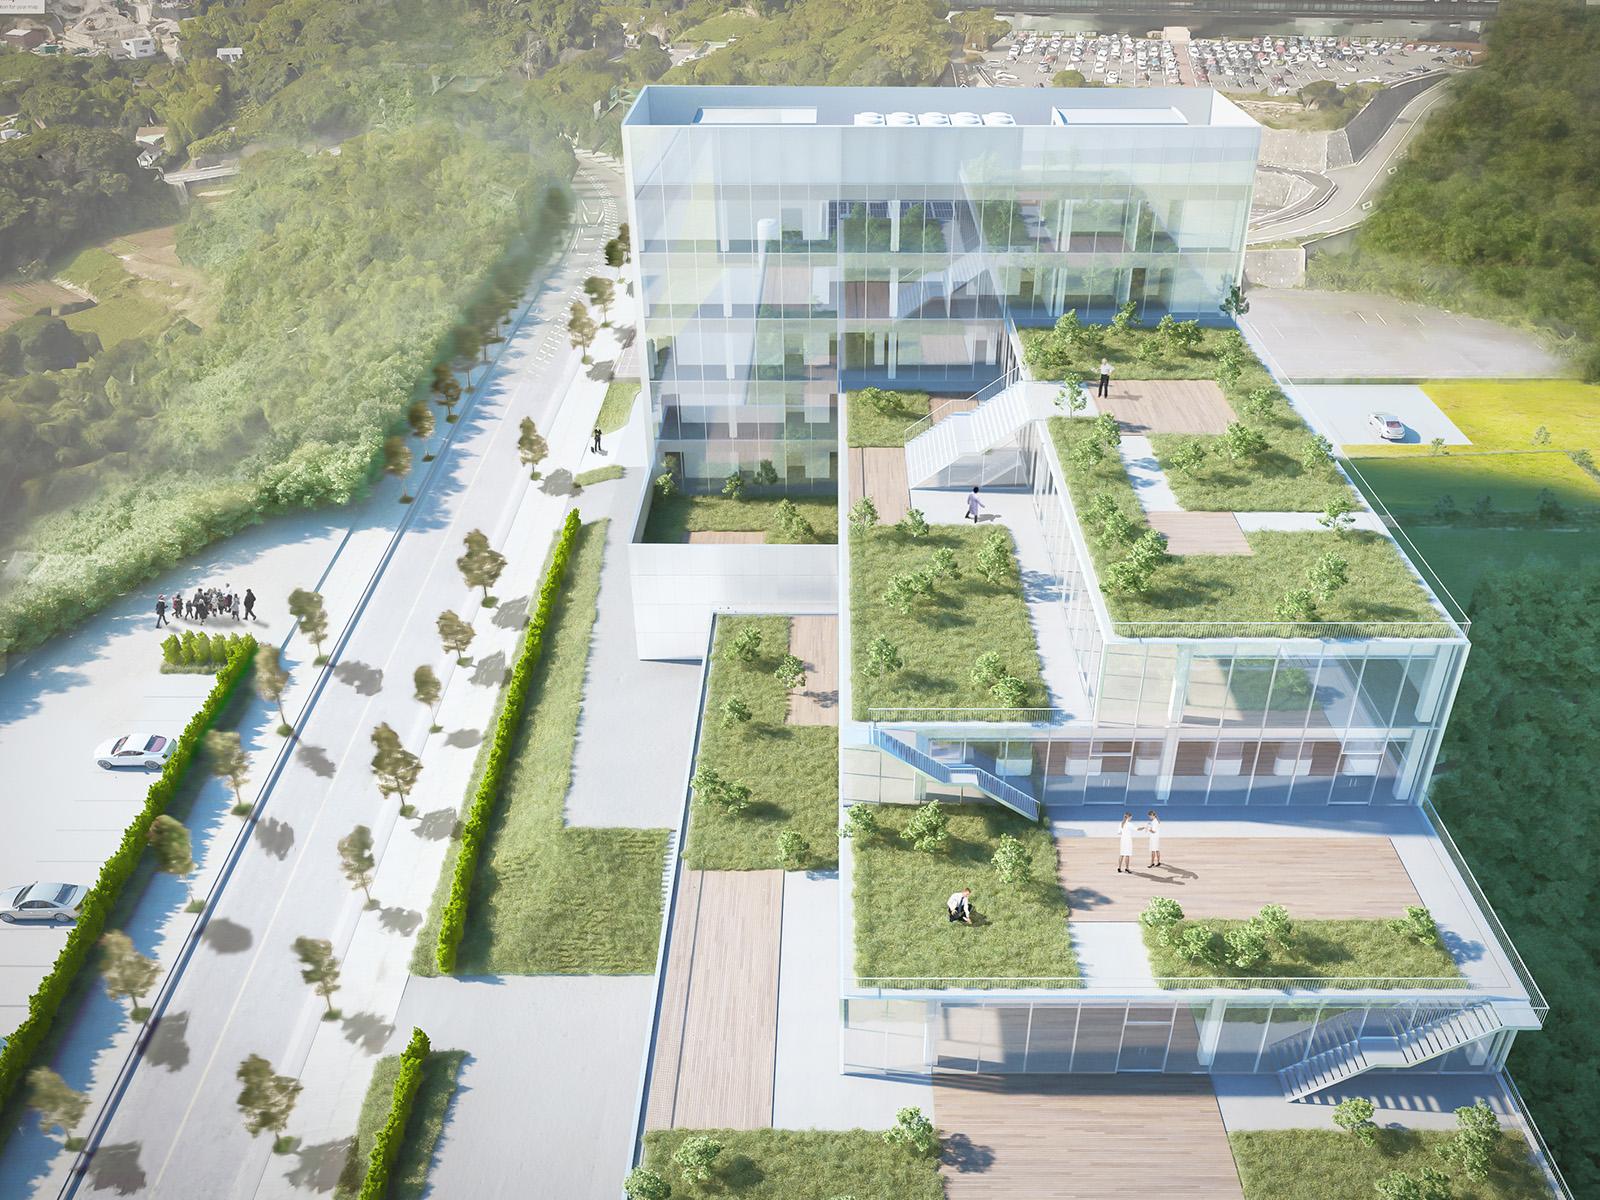 Yokosuka Inovation Center